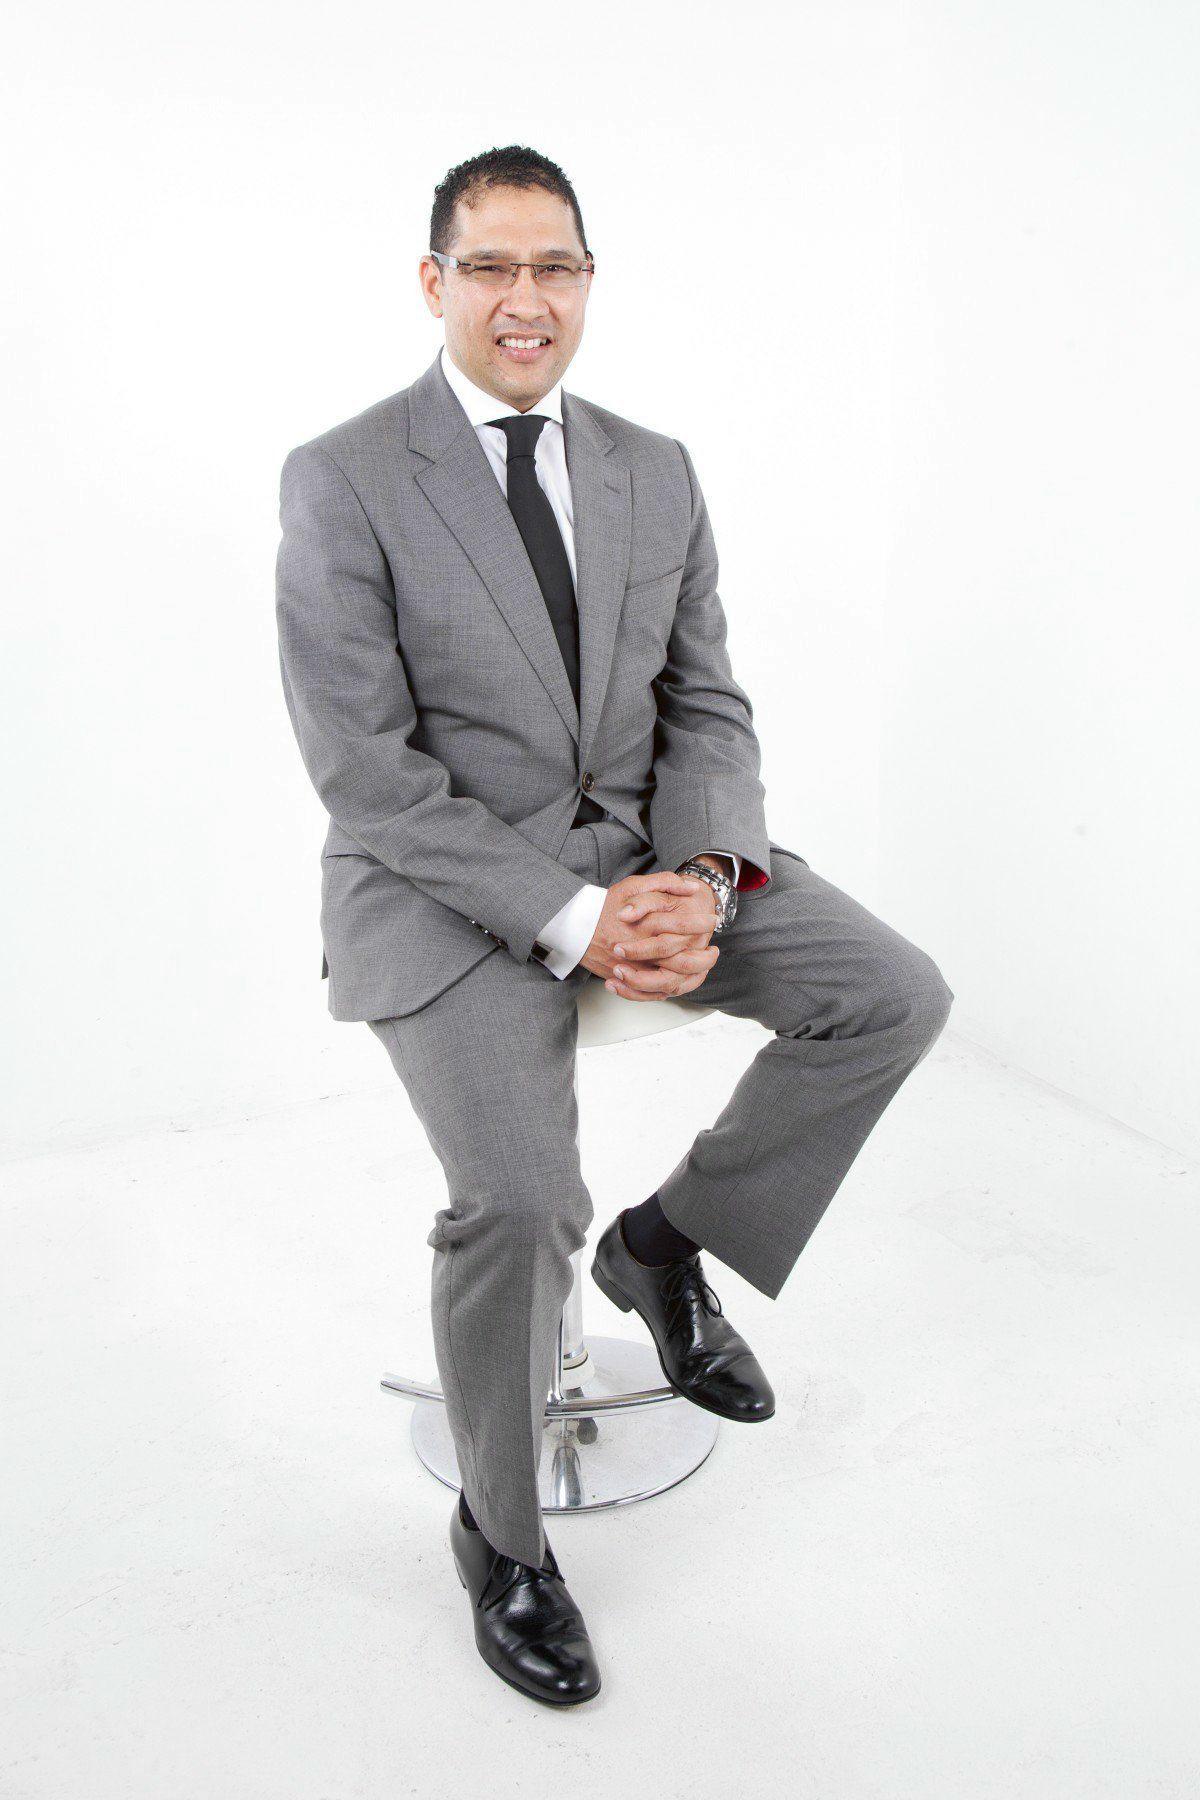 entrepreneur_boss_man_businessman_young_professional_corporate_people-868229-business-man